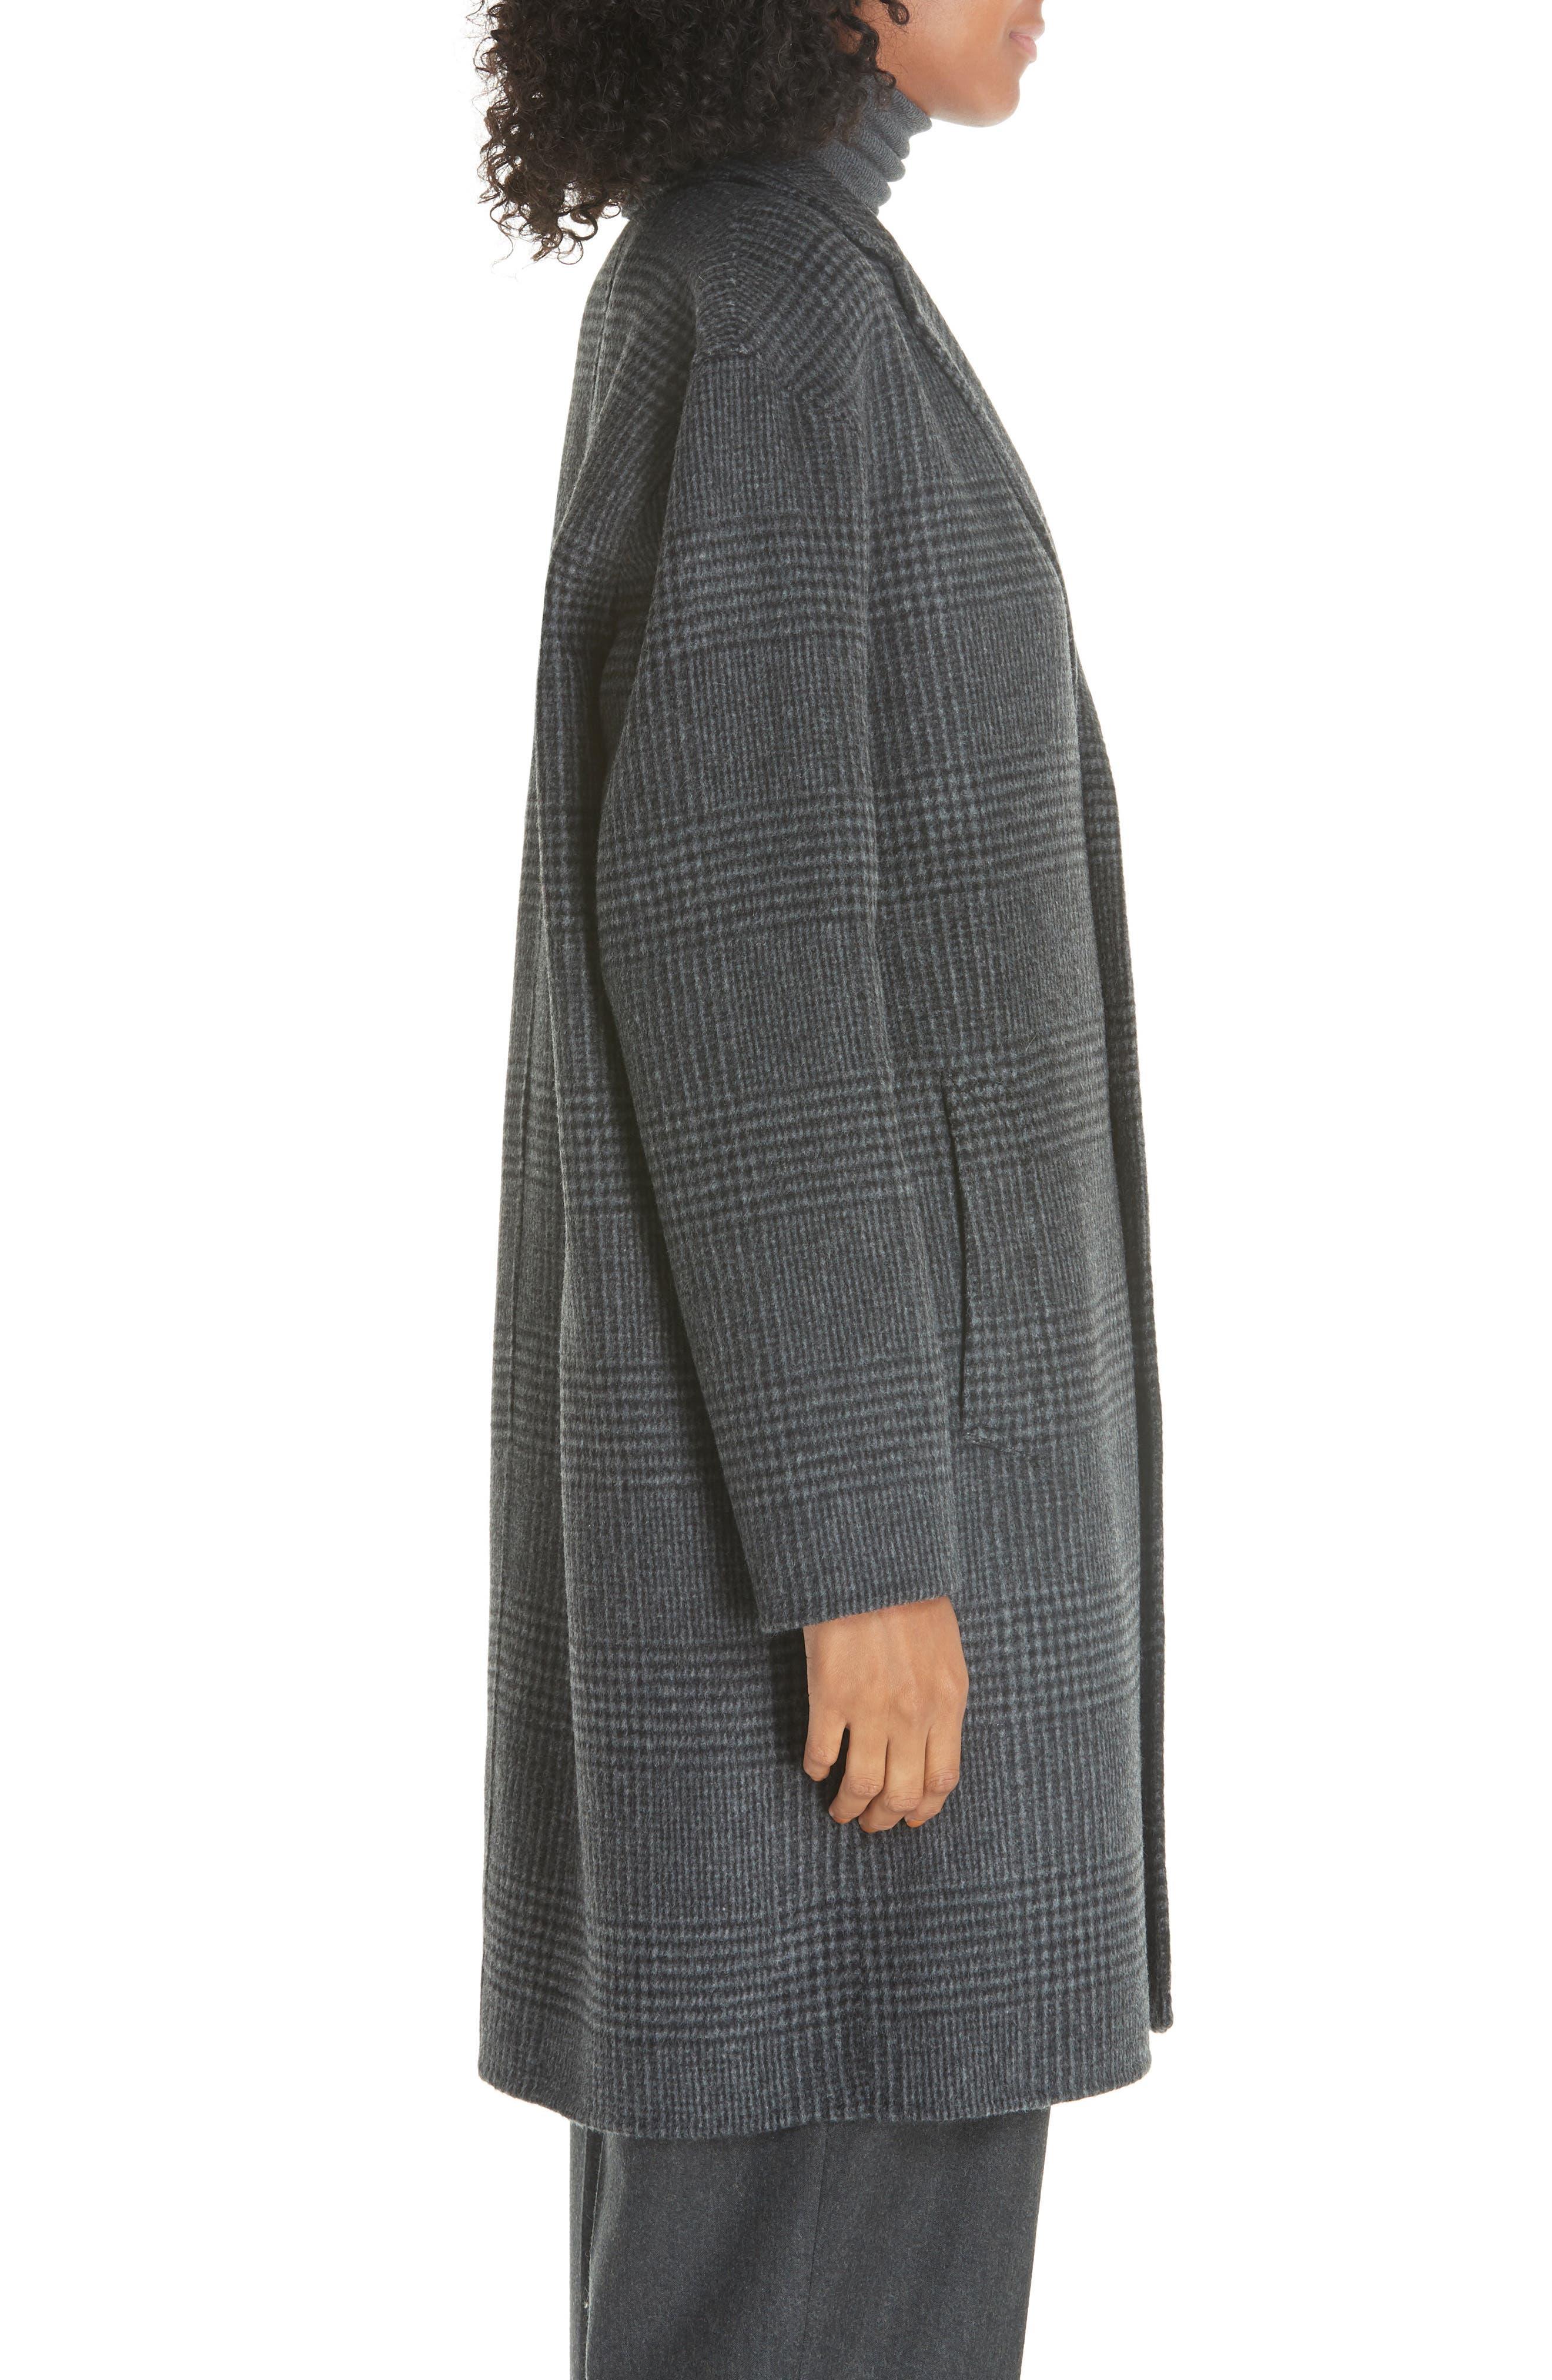 Plaid Wool Blend Coat,                             Alternate thumbnail 3, color,                             CHARCOAL GLEN PLAID